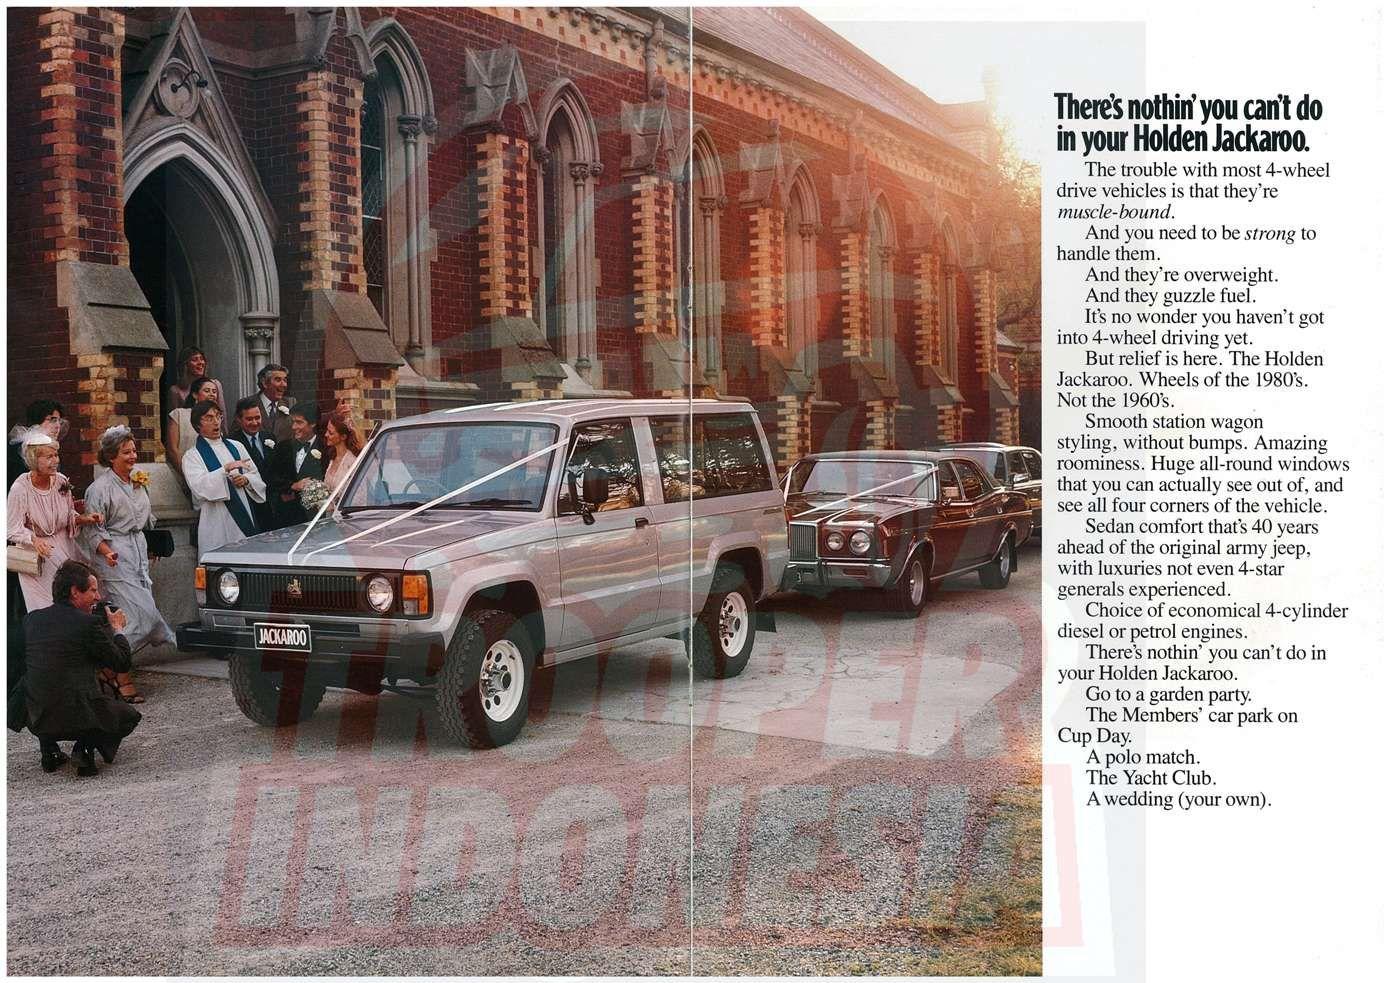 Holden_Jackaroo_1982_p2.jpg